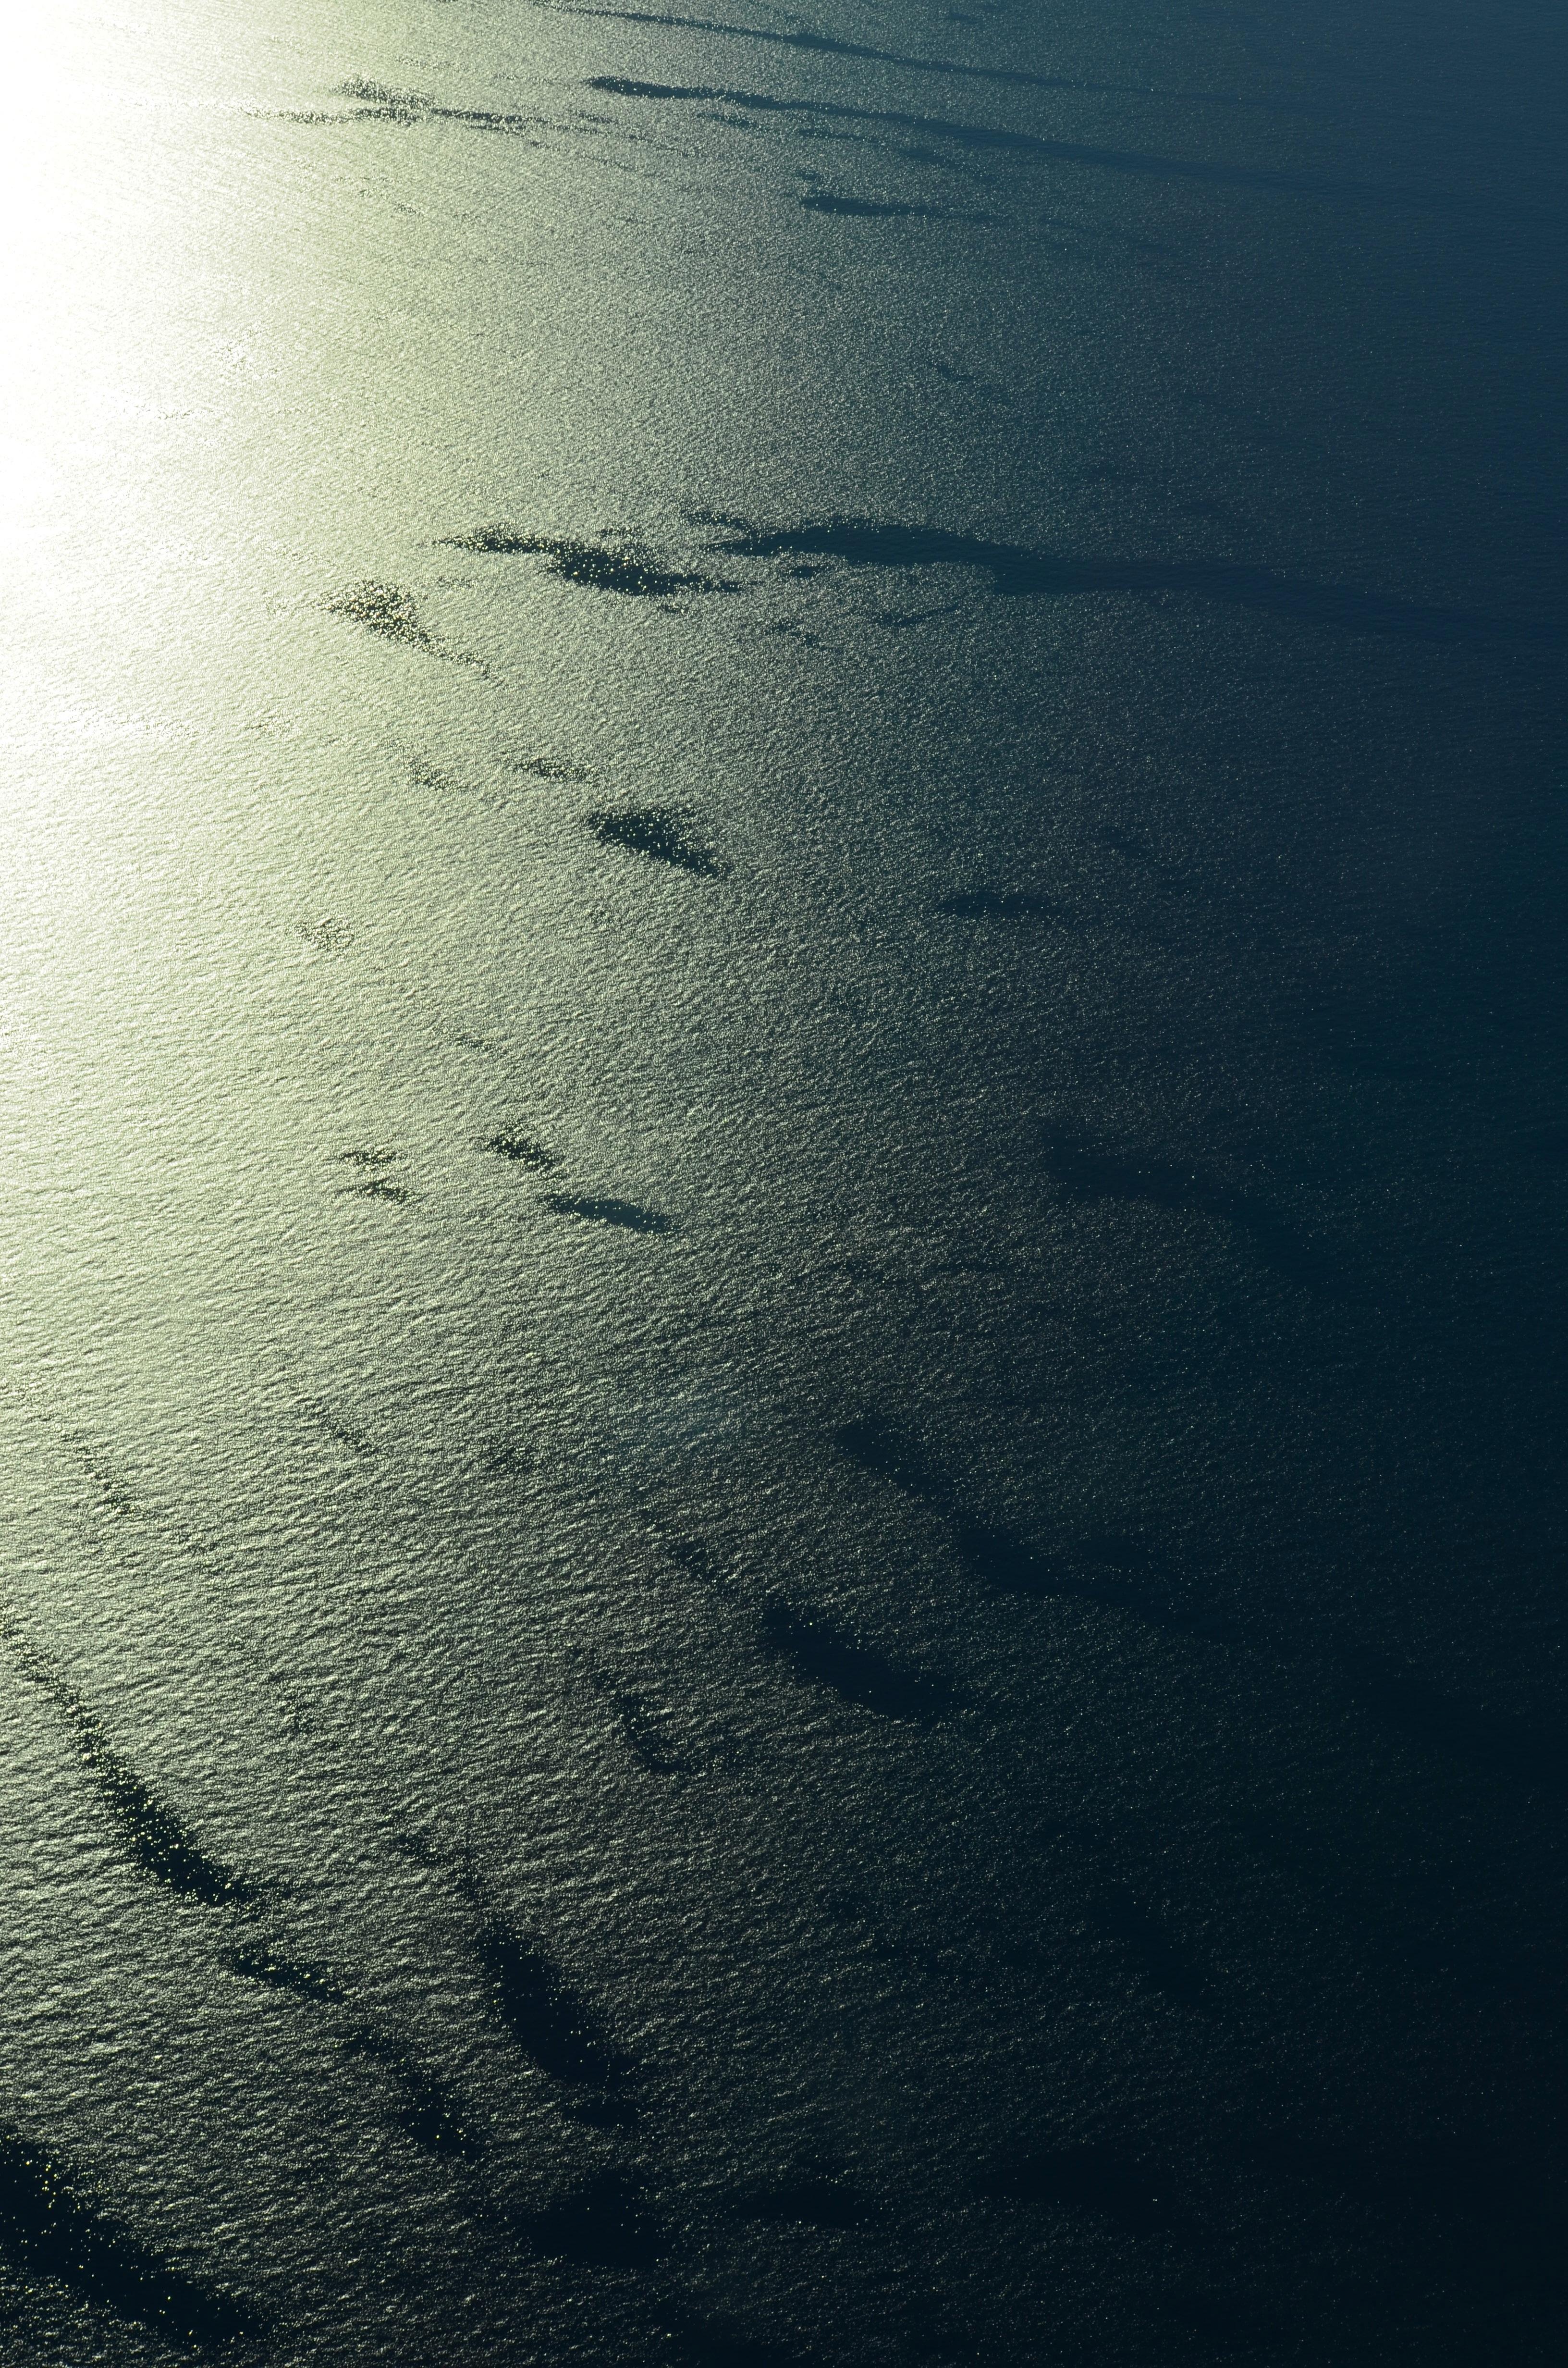 Calm Water Texture free images : sea, water, ocean, horizon, light, cloud, black and